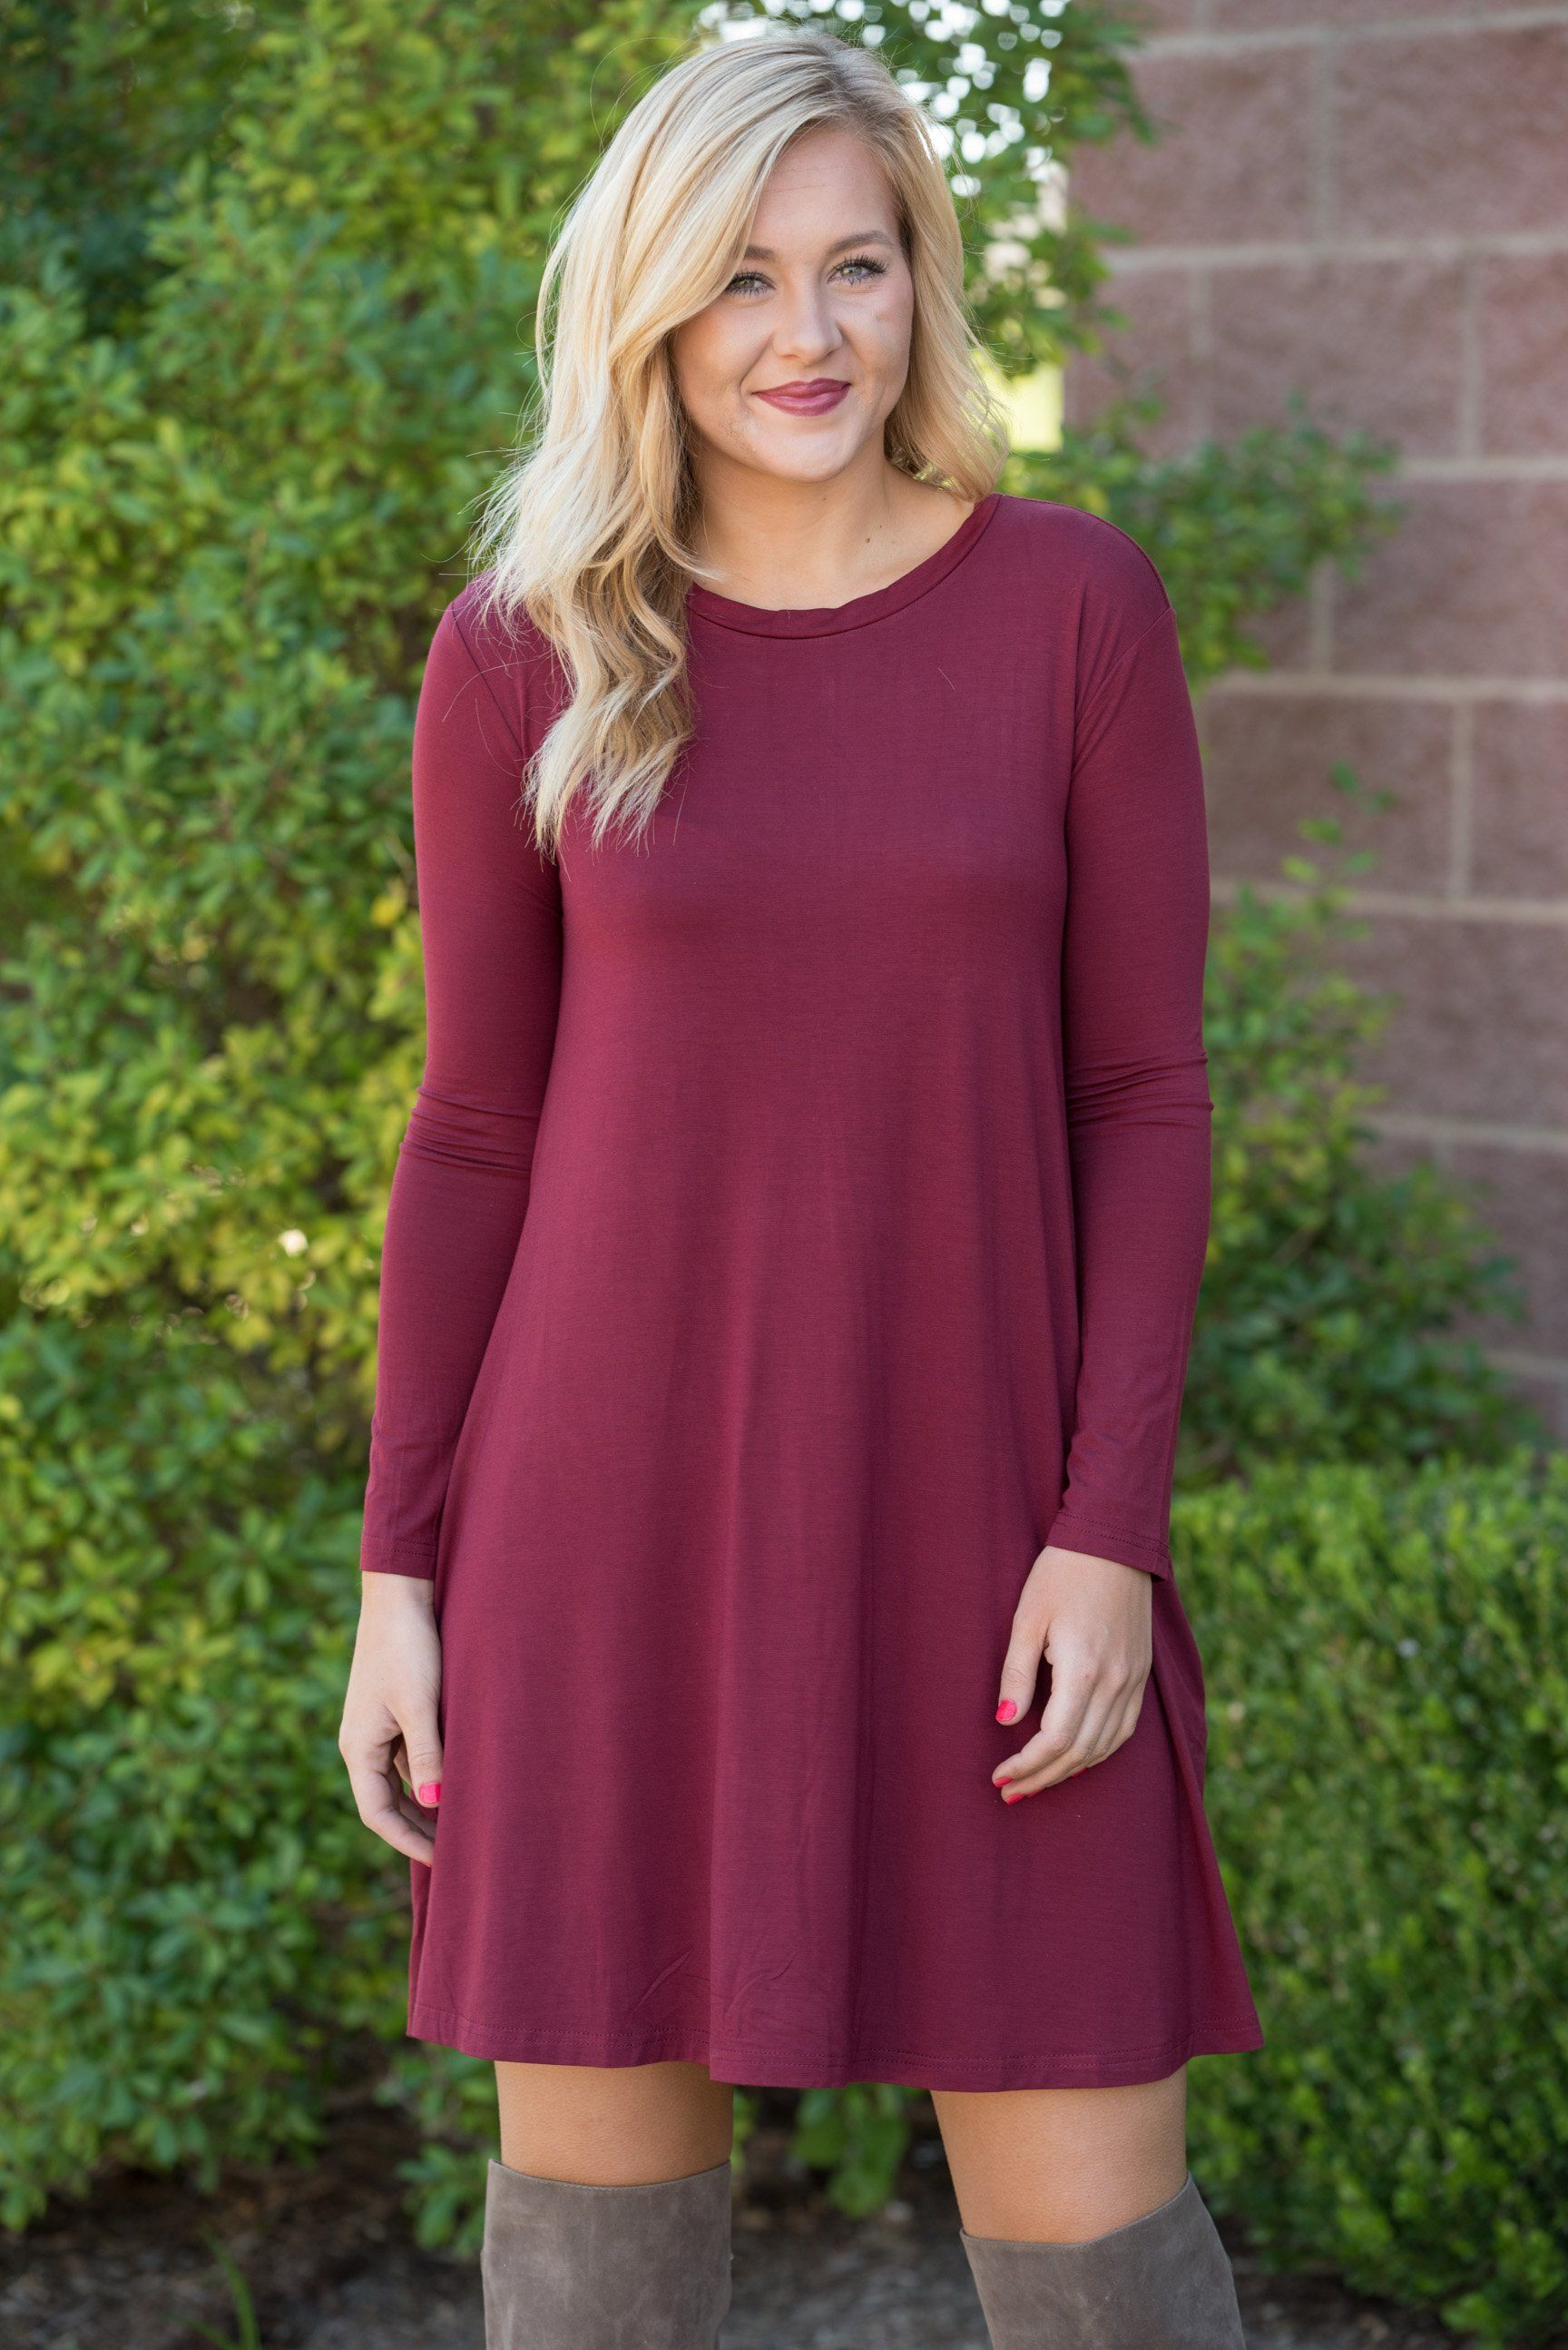 b3140badfbd8f Piko long sleeve swing dress plum | Products